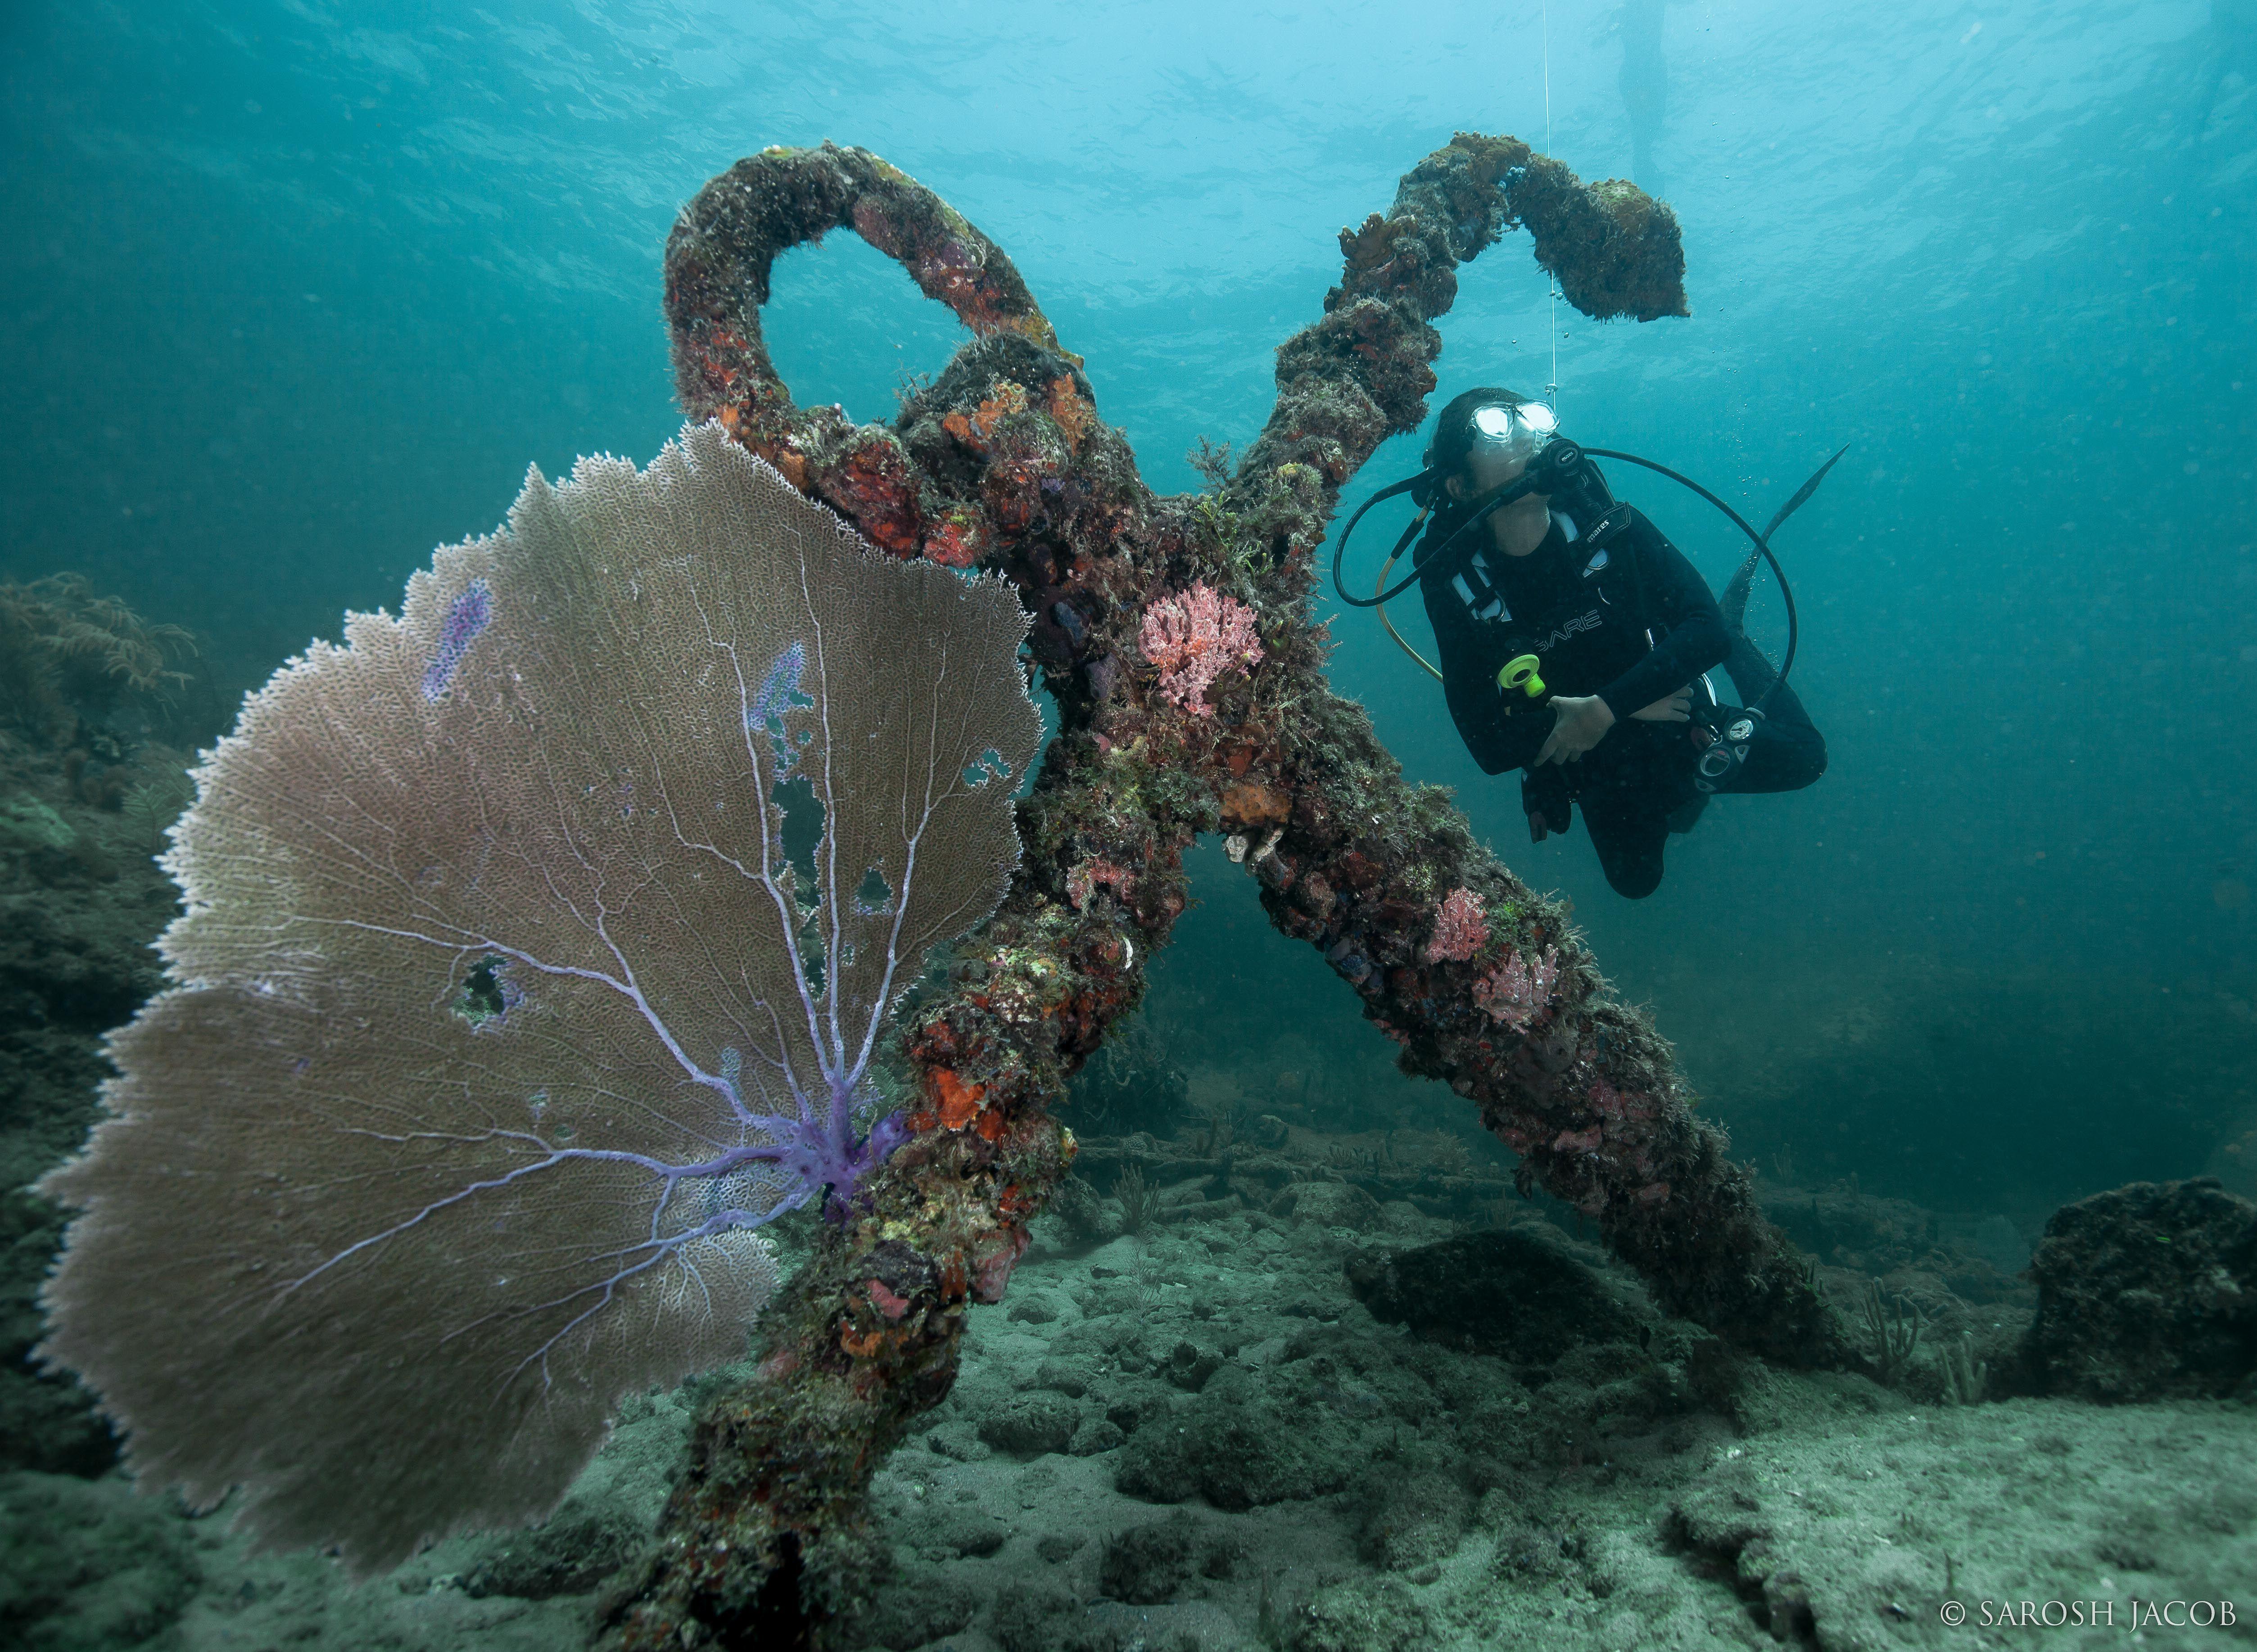 Exploring The Wreck - by: Sarosh Jacob